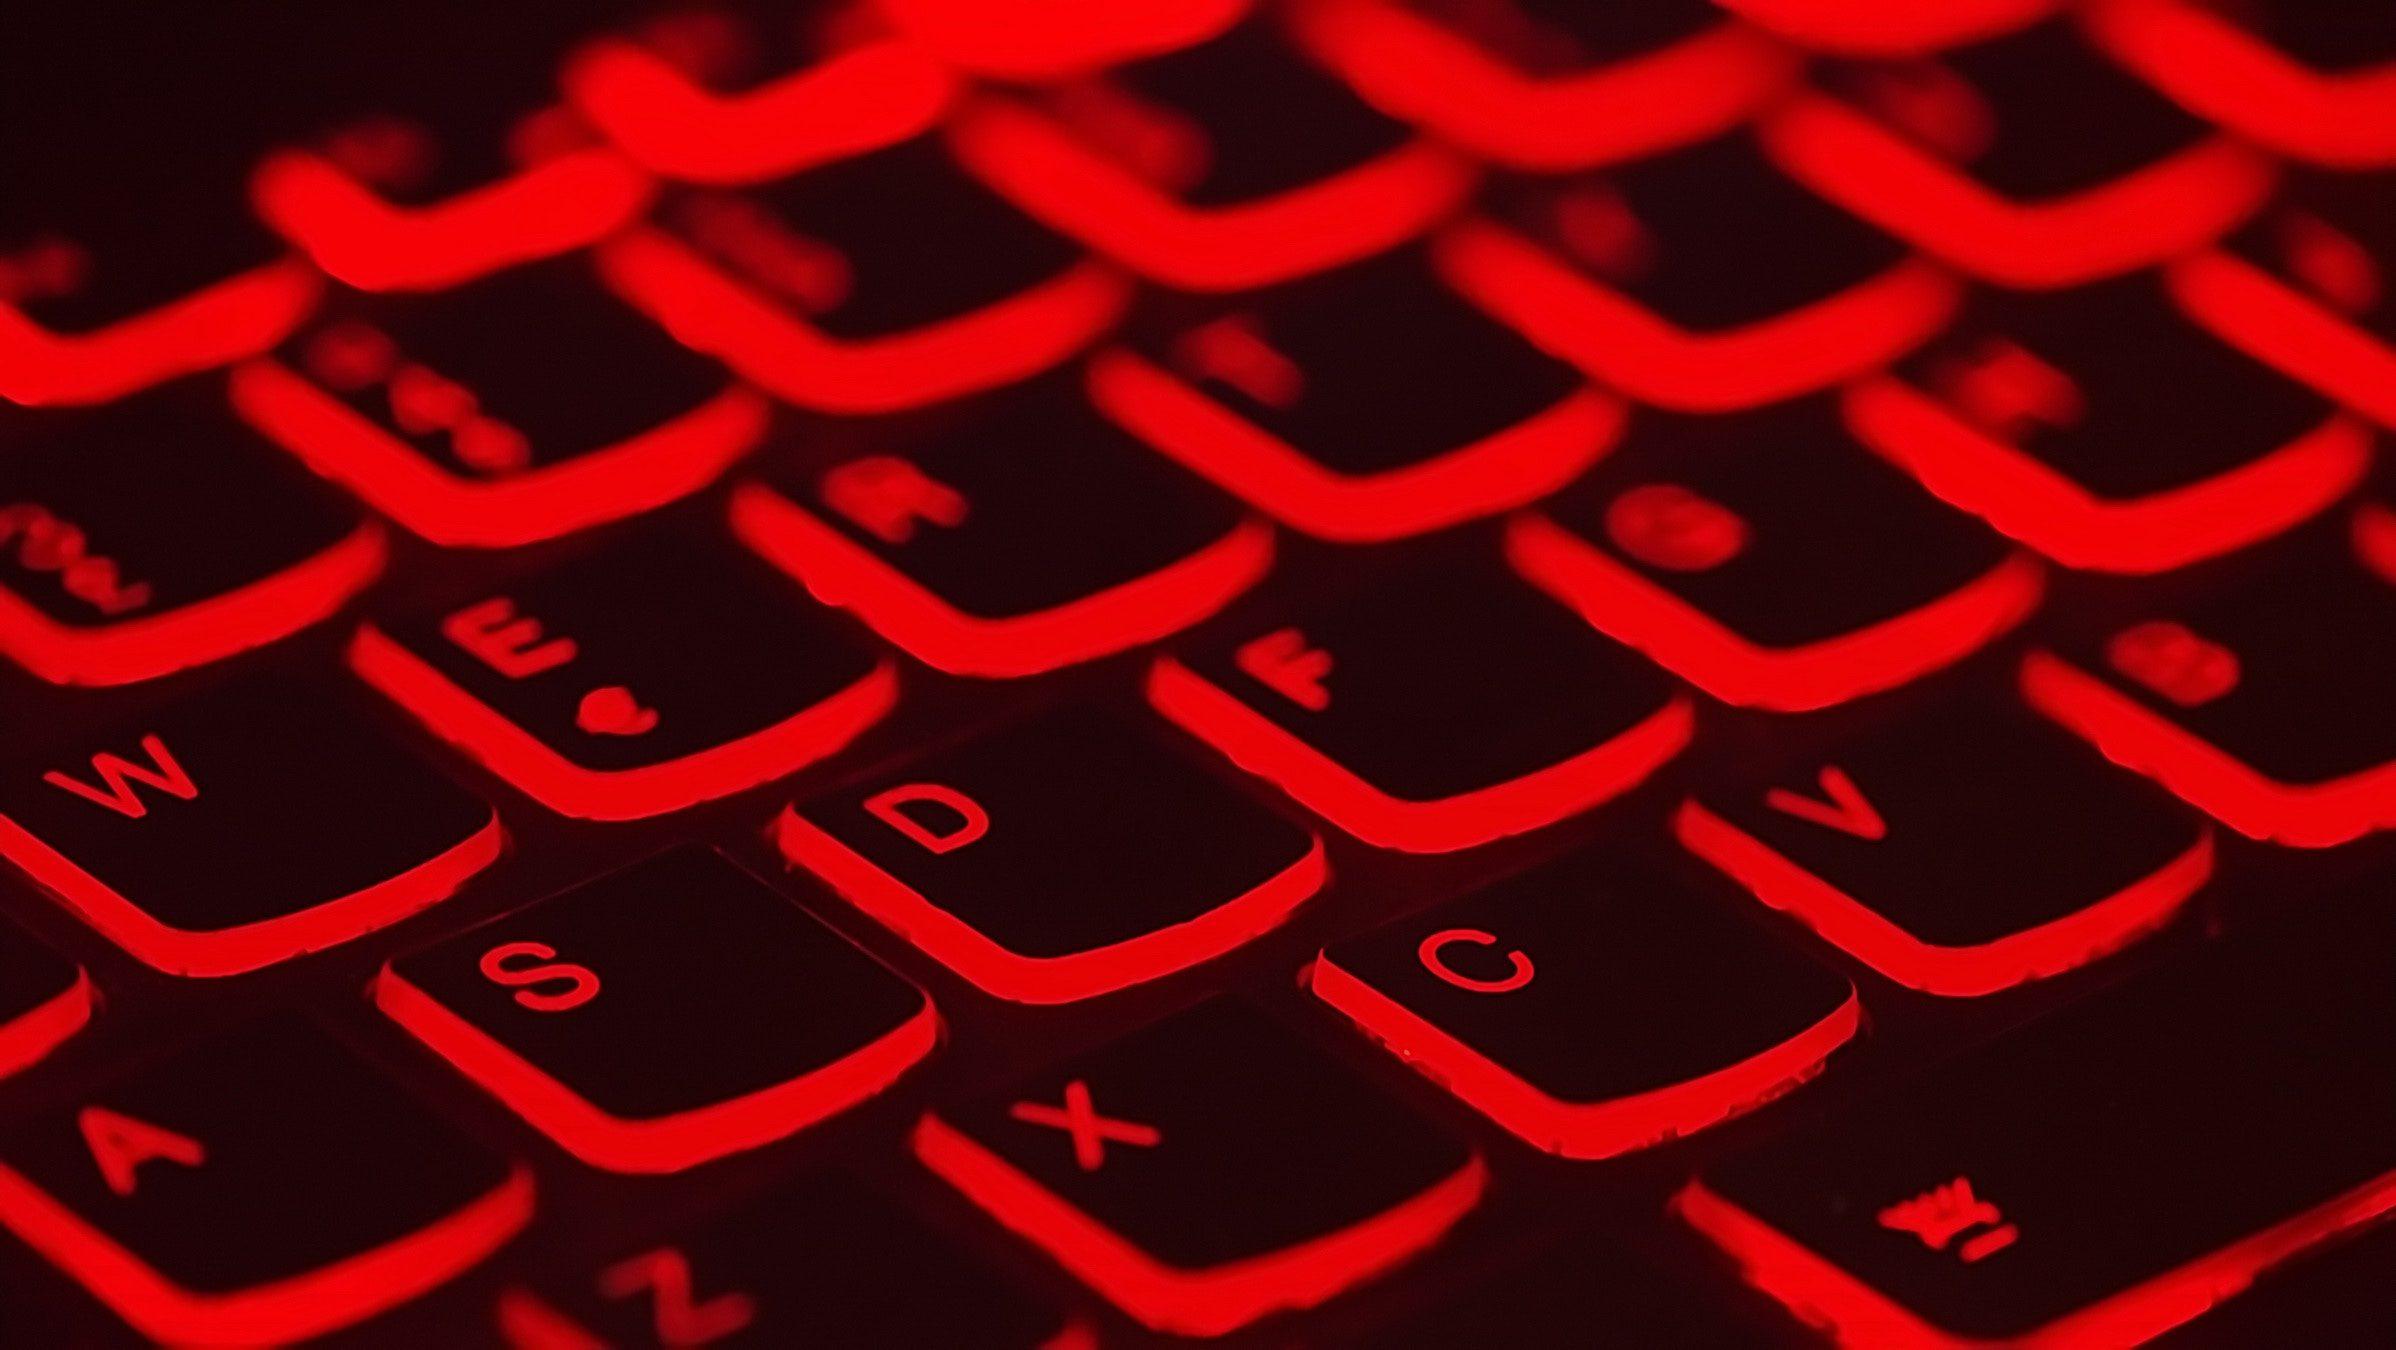 The Impact of Cybersecurity Threats in K-12 Schools